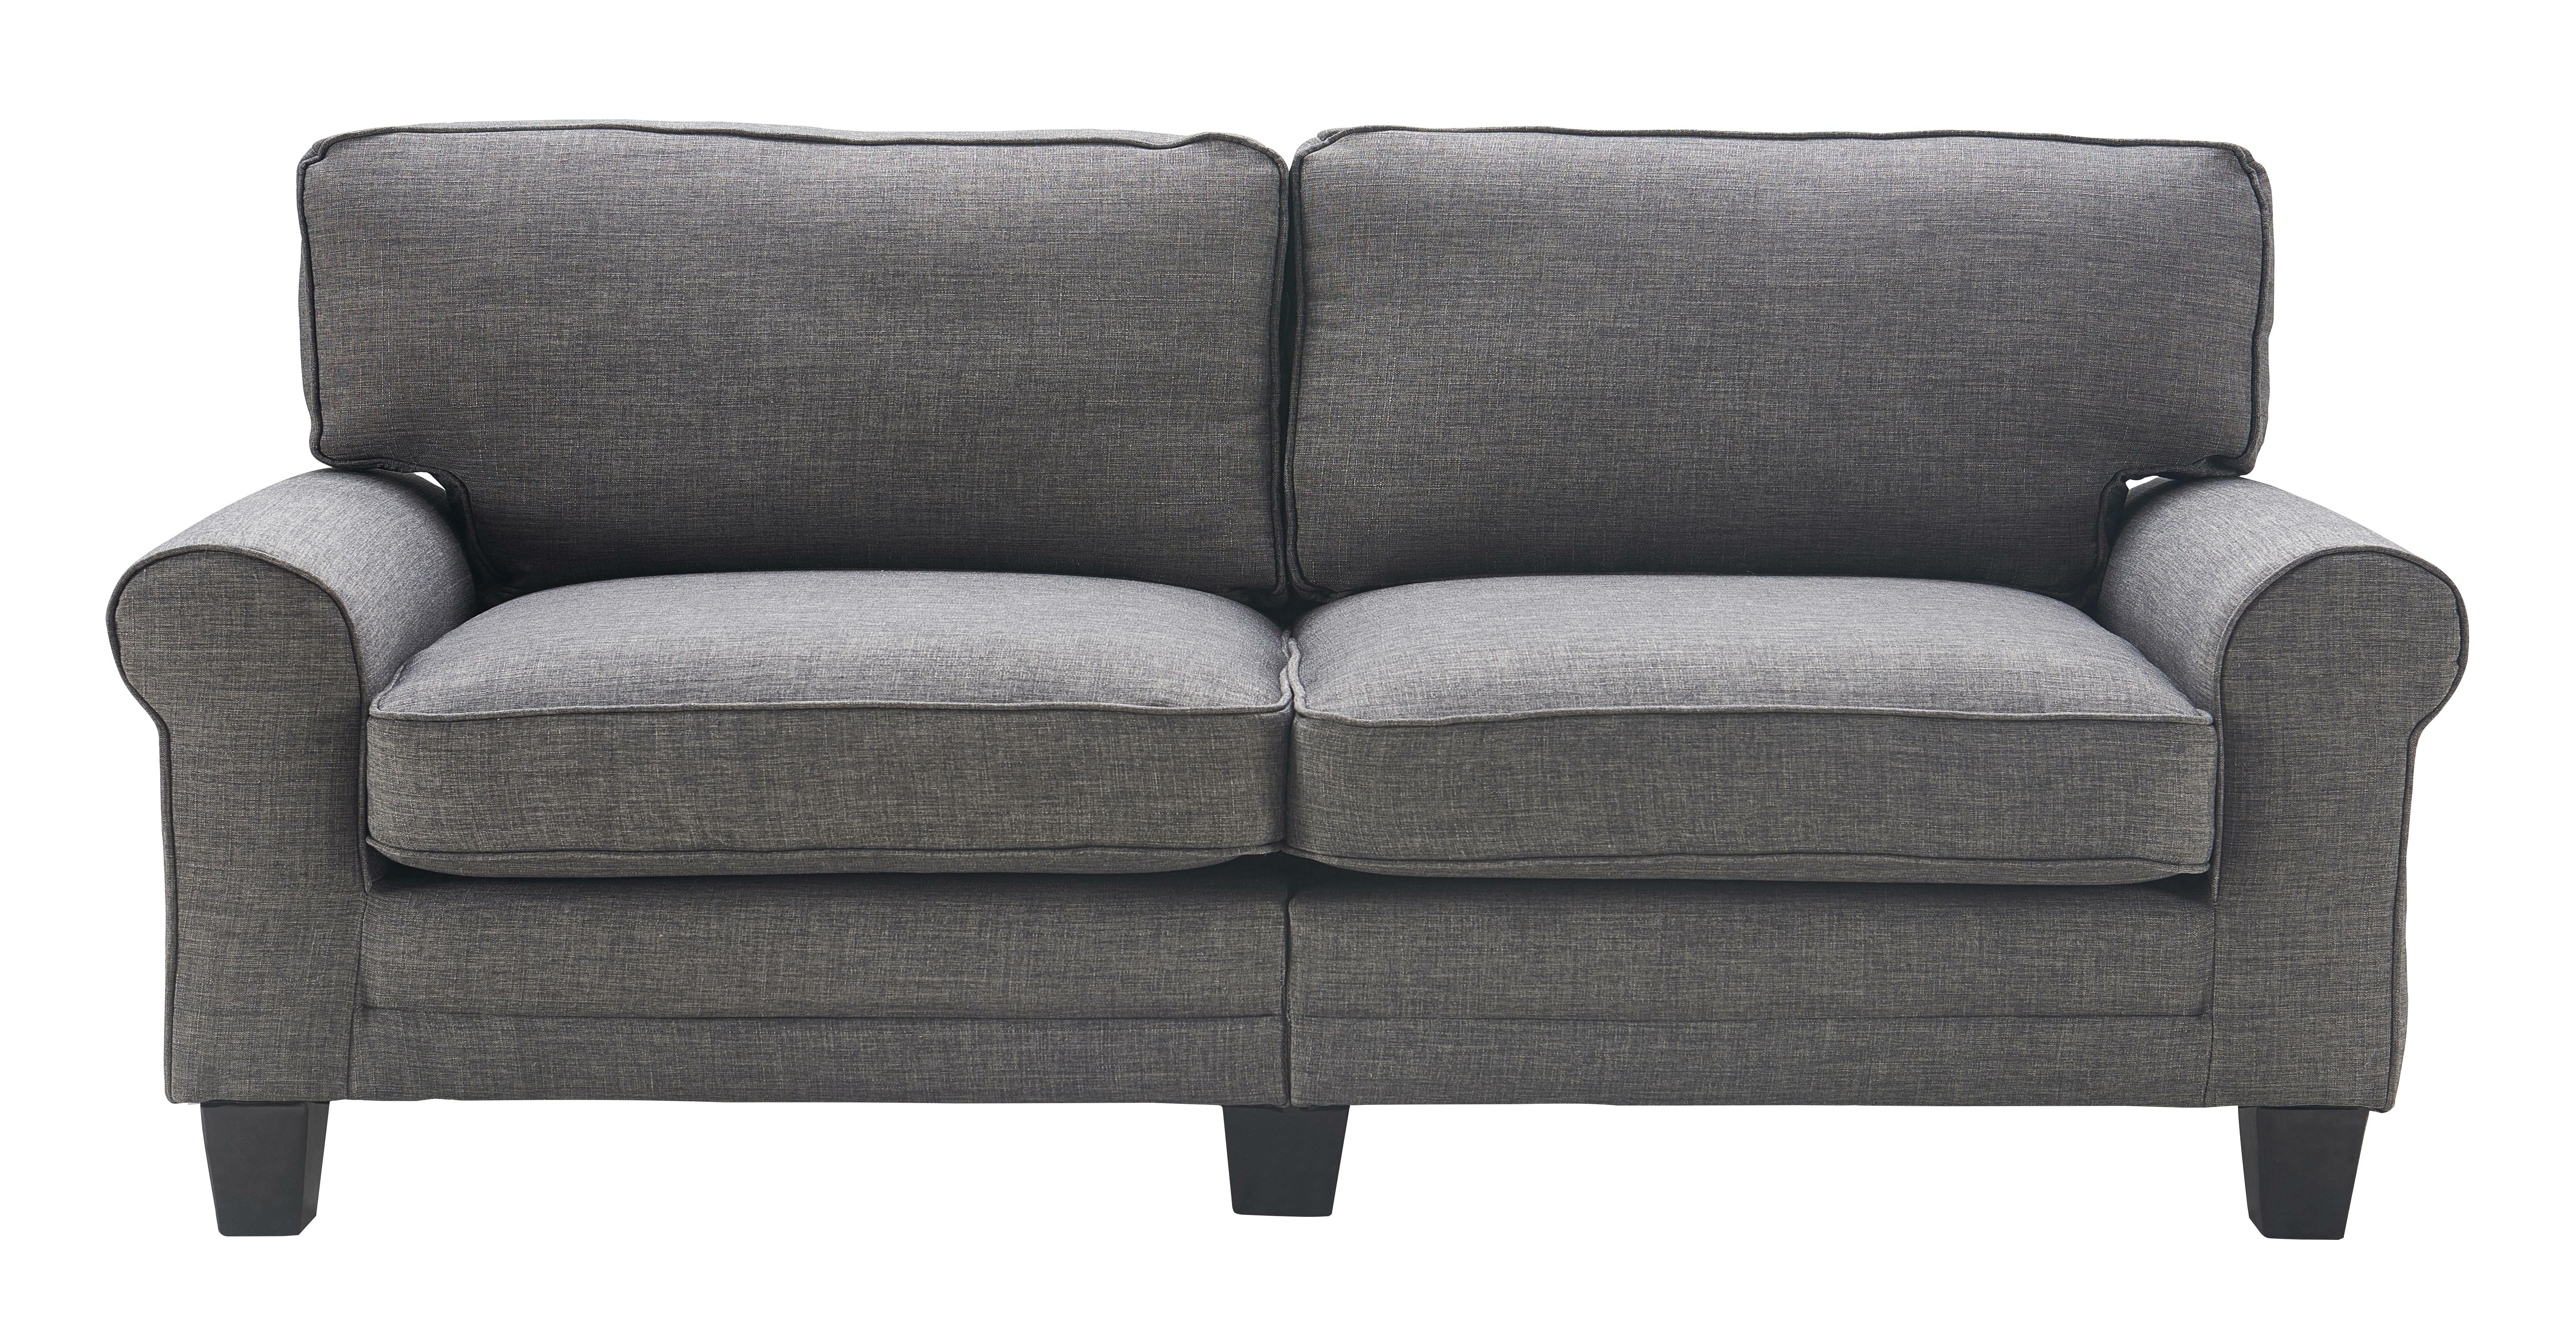 sofa off rta nyc grey couch palisades serta sofas